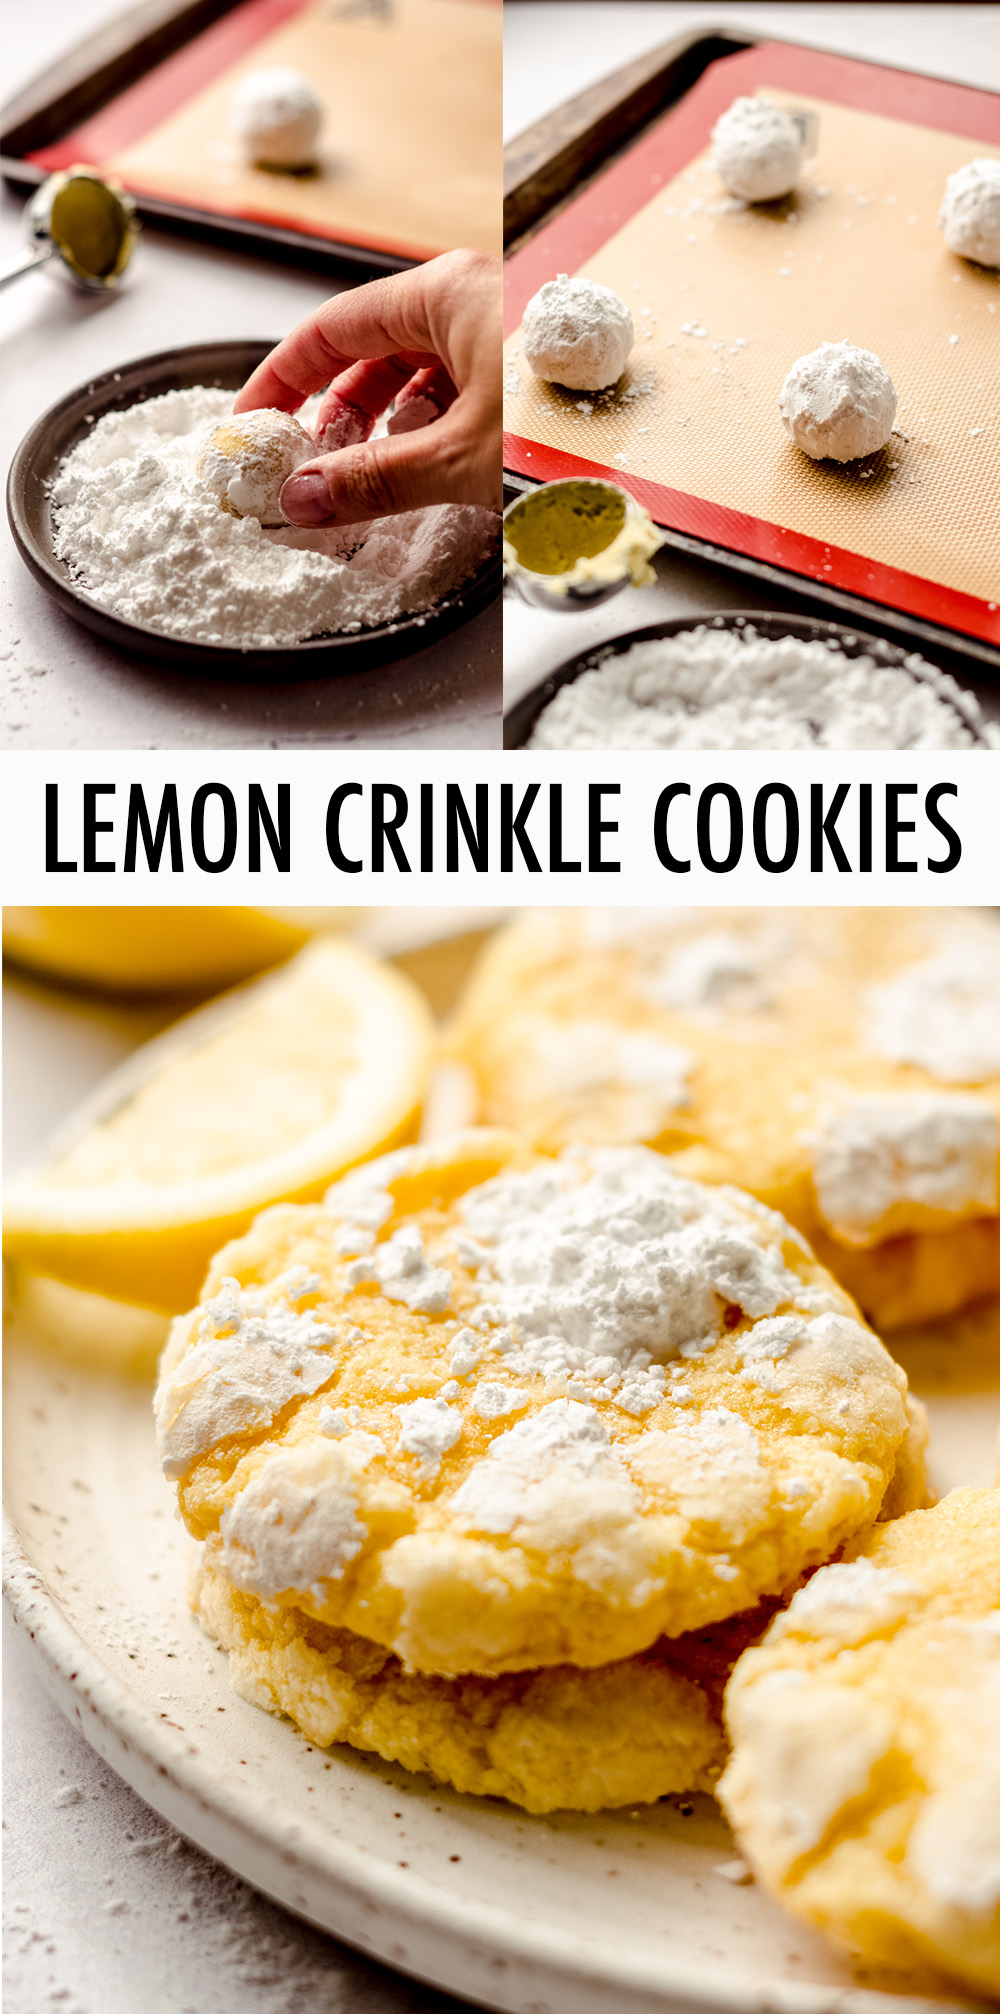 Sweet and tart crinkle cookies bursting with bright lemon flavor.